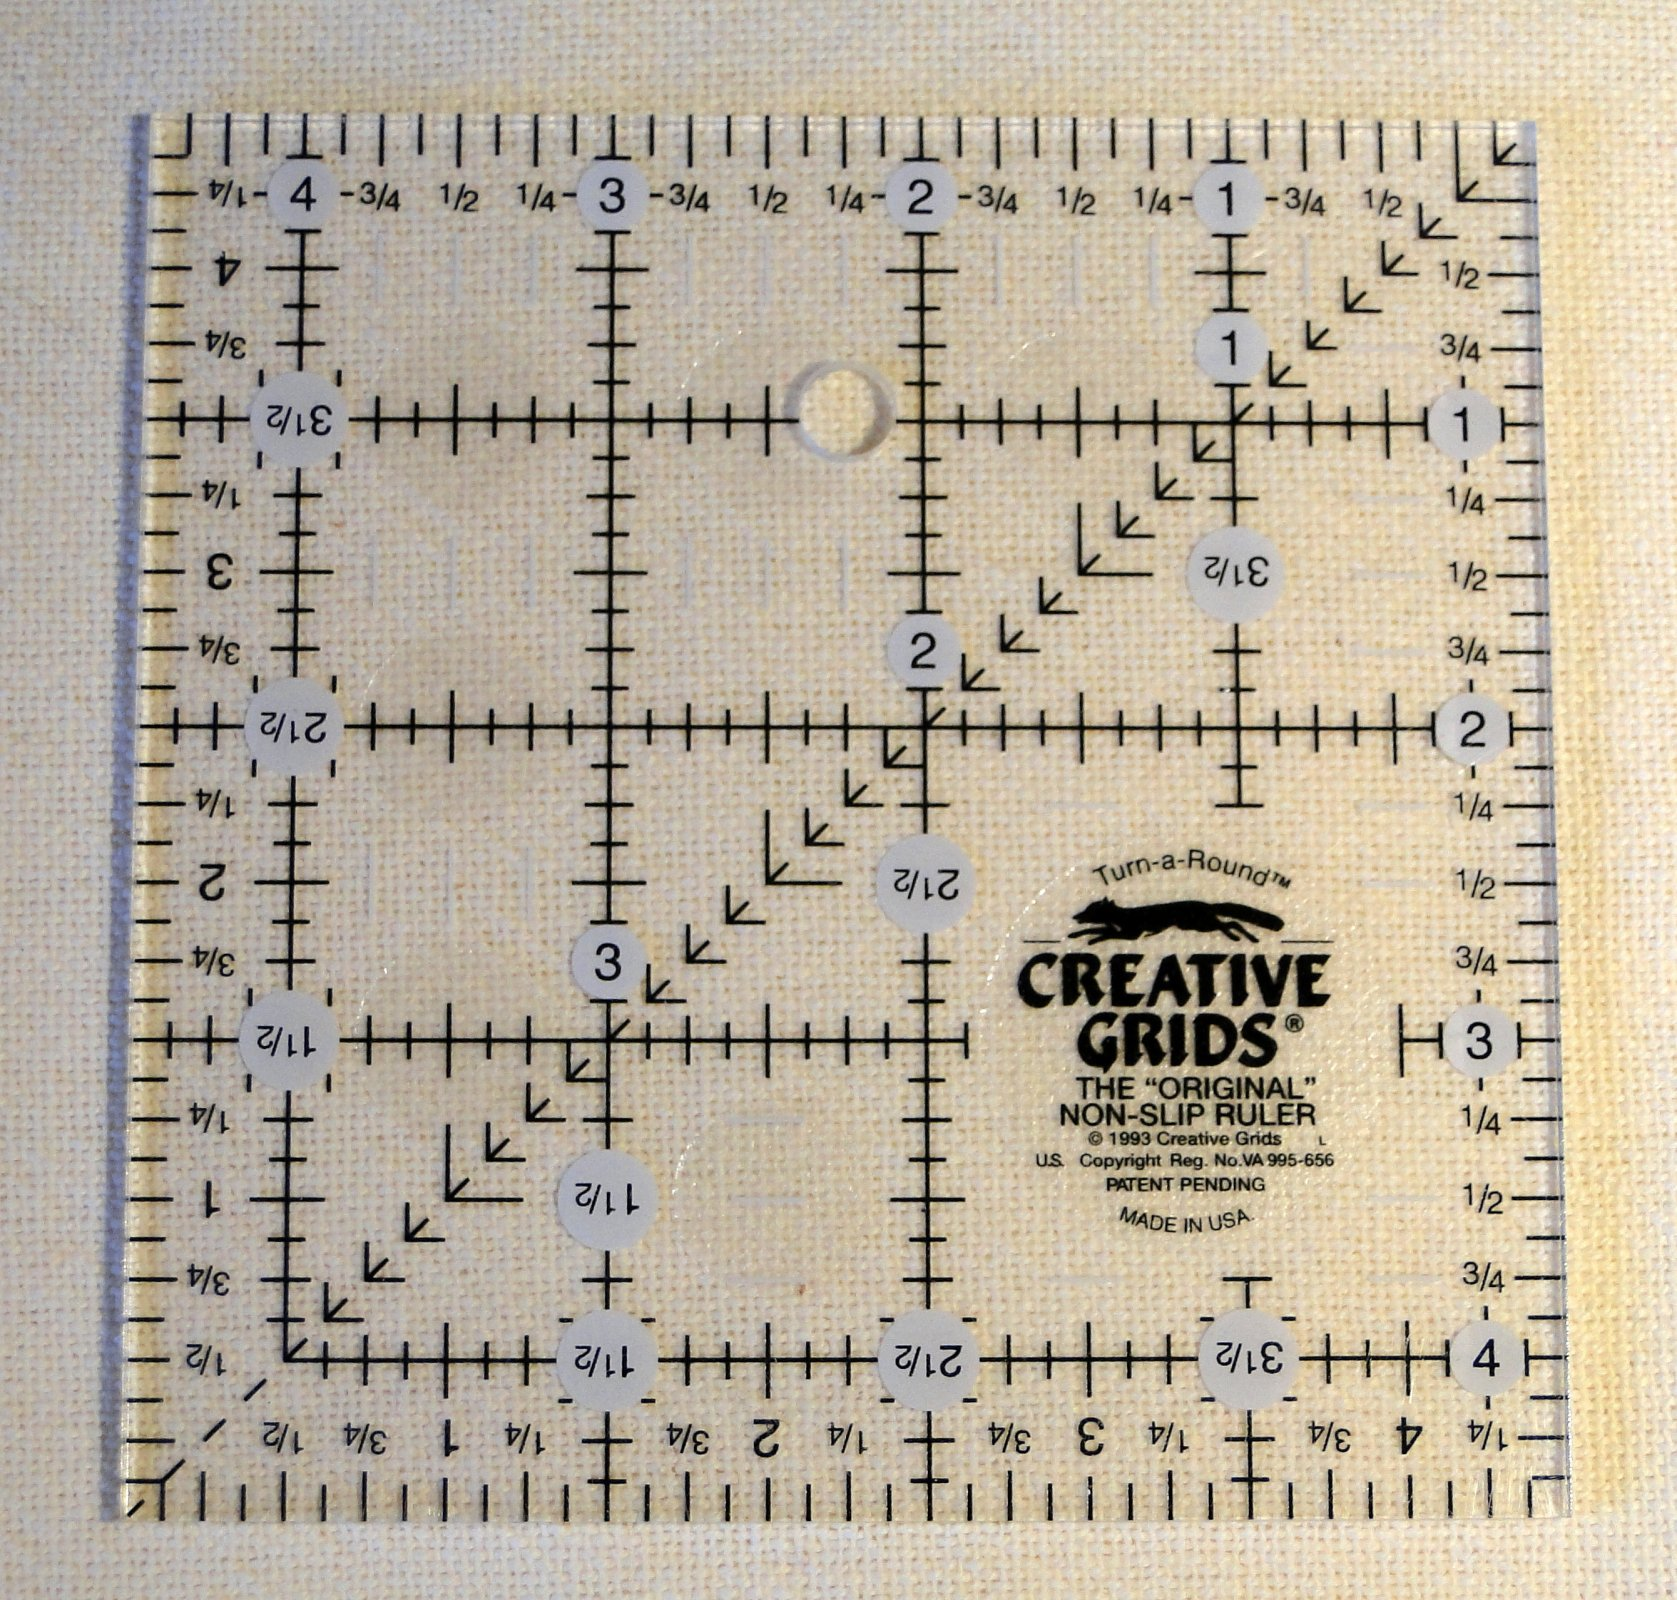 4.5 inch Creative Grids Non-Slip Ruler